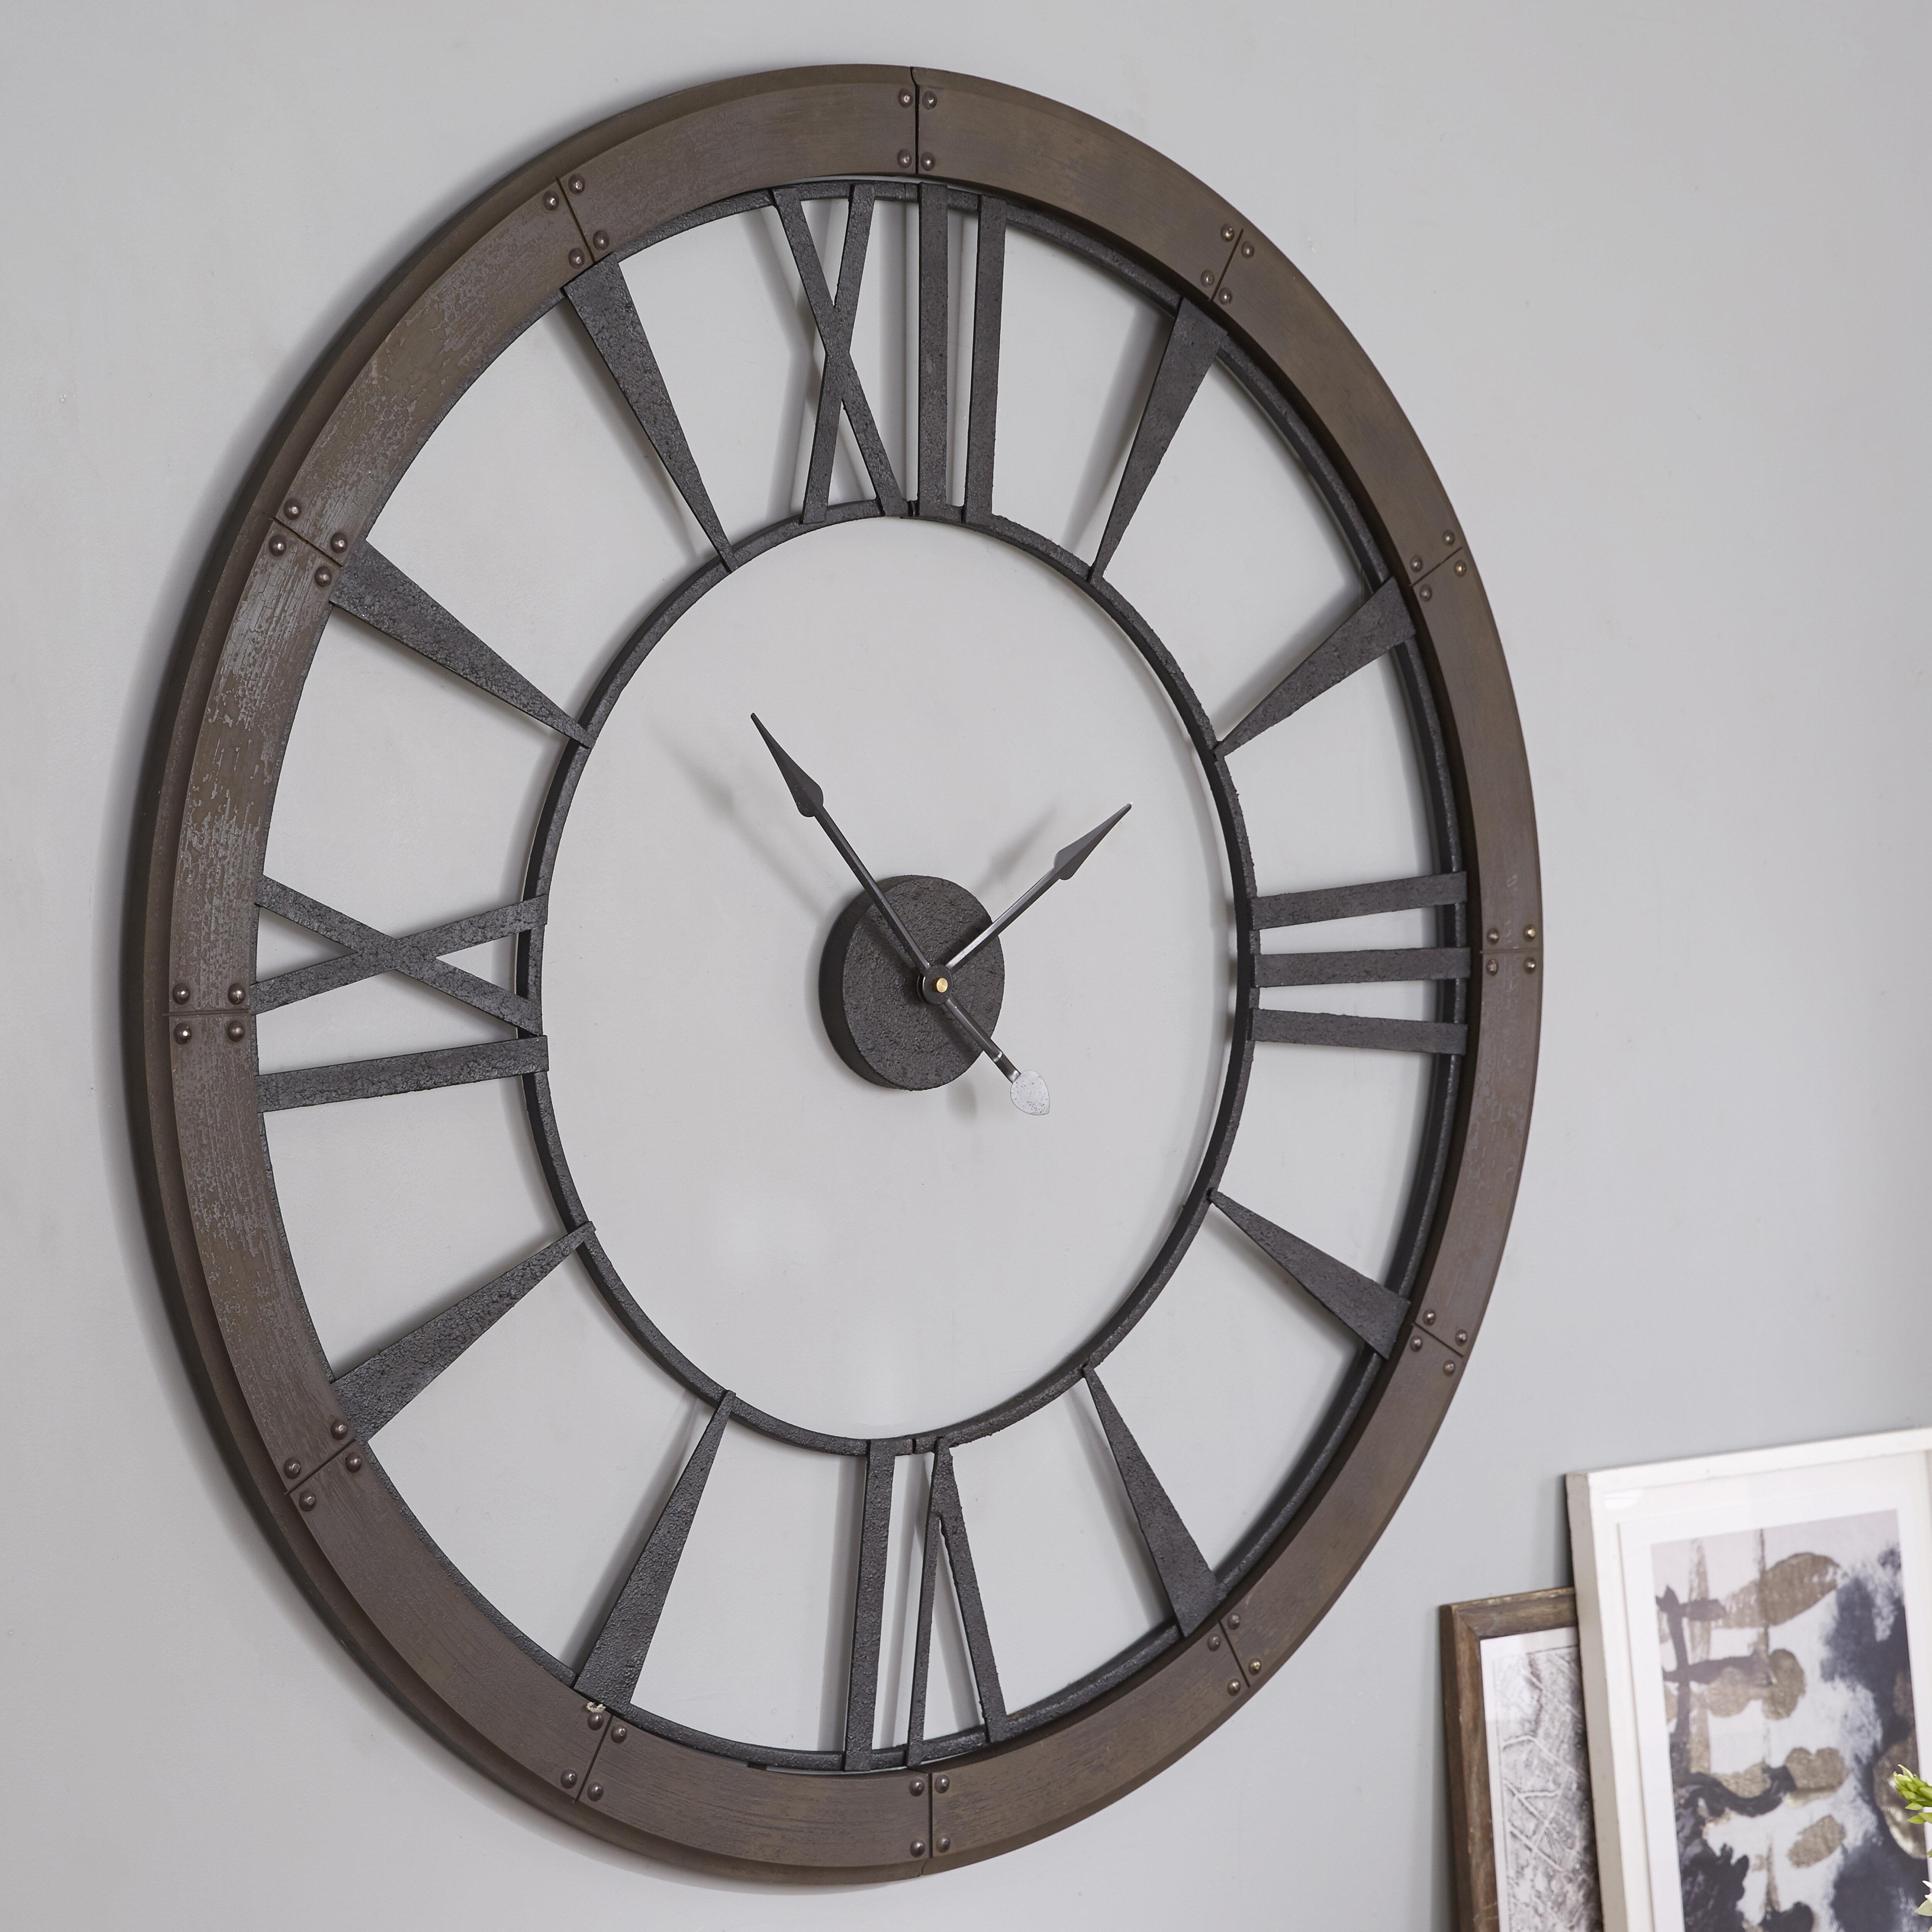 Lily Manor Oversized Paray 152 4cm Wall Clock Reviews Wayfair Co Uk